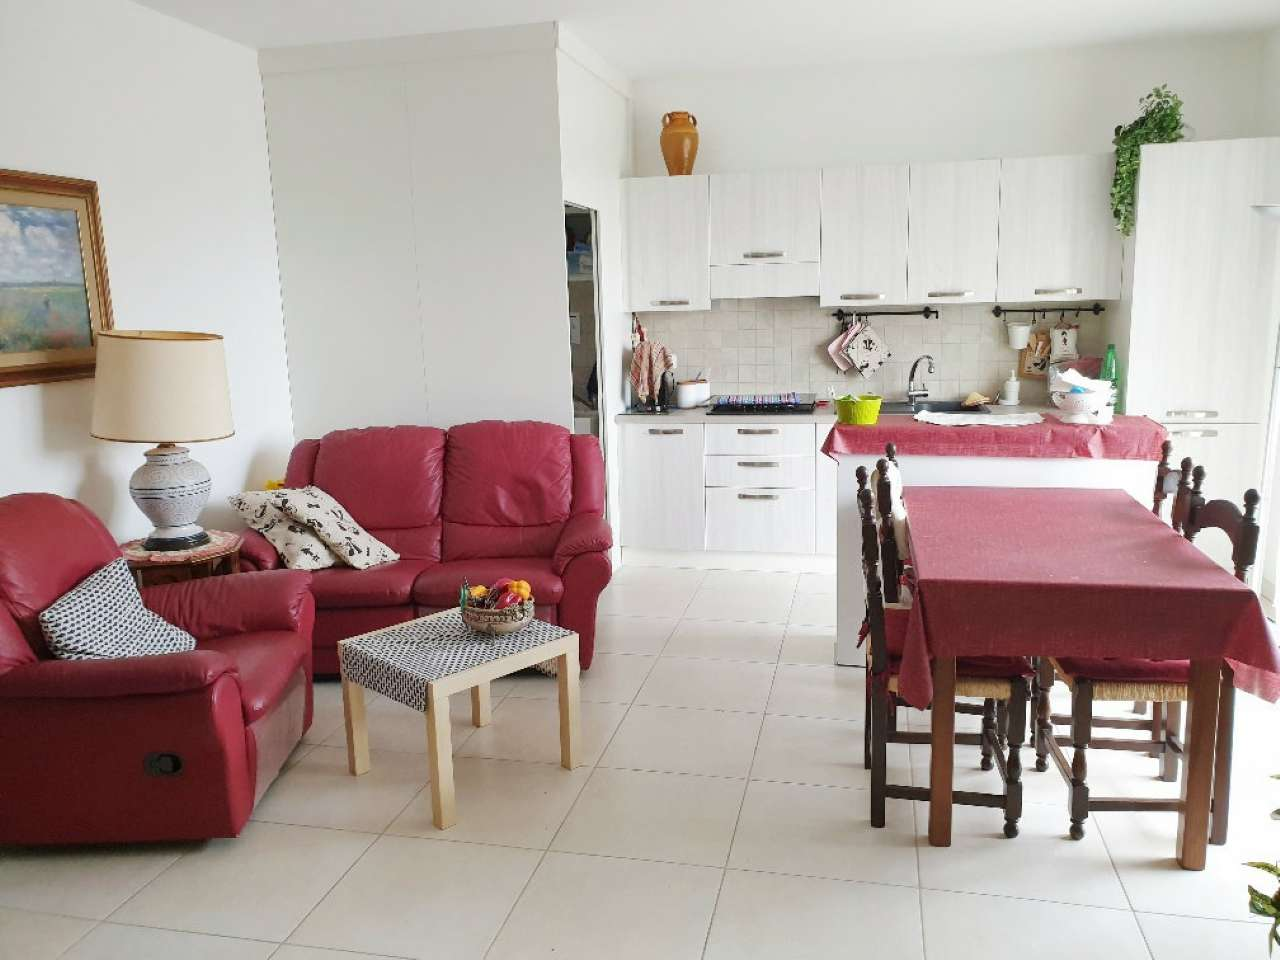 Appartamento in vendita a Bellaria Igea Marina, 3 locali, Trattative riservate   PortaleAgenzieImmobiliari.it